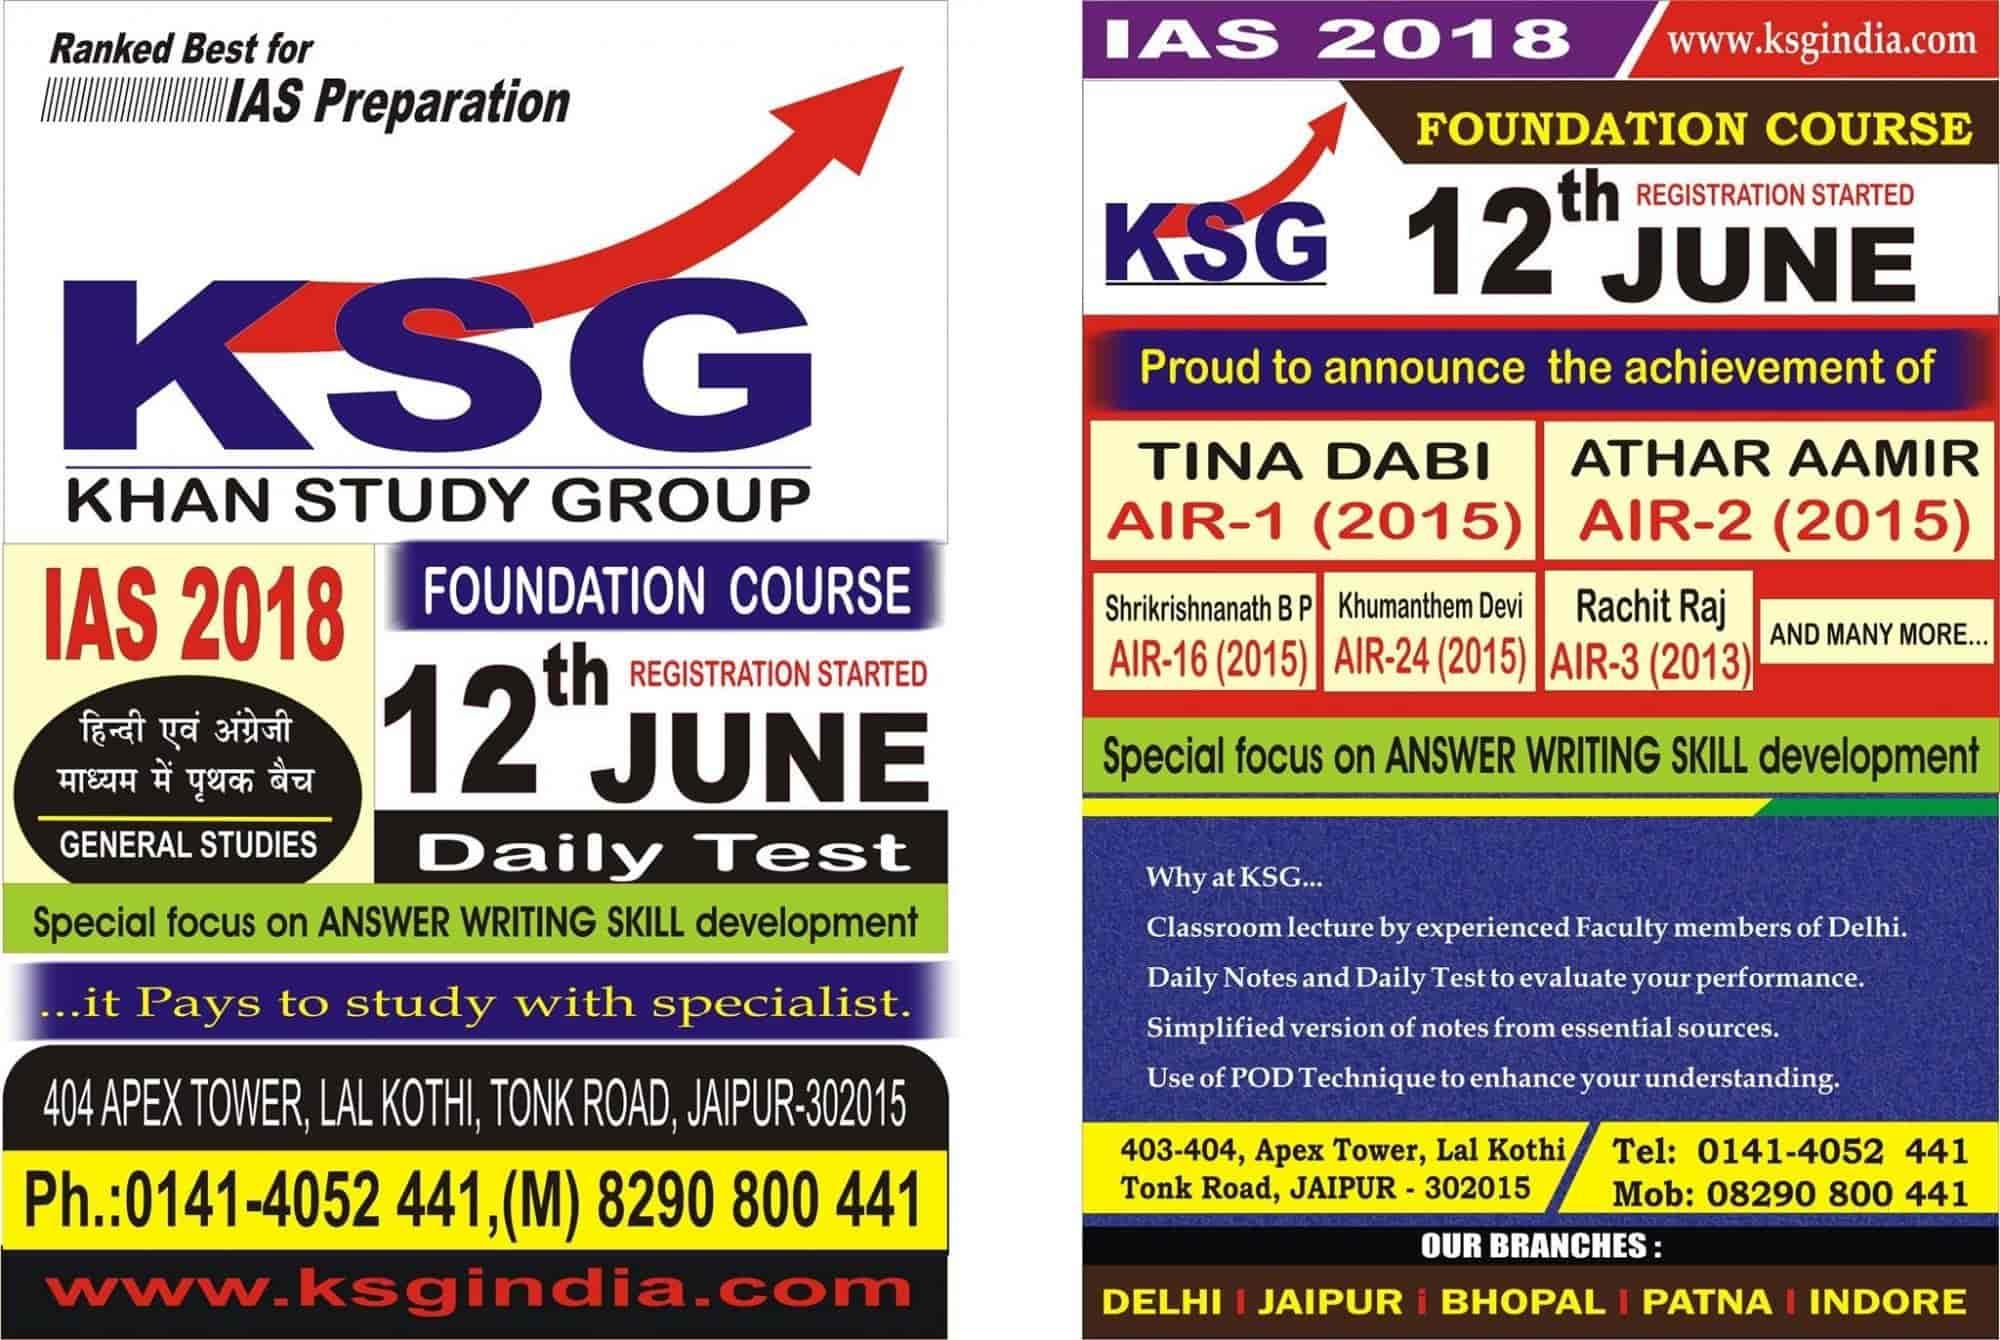 K s g IAS Institute, Lal Kothi - Tutorials in Jaipur - Justdial